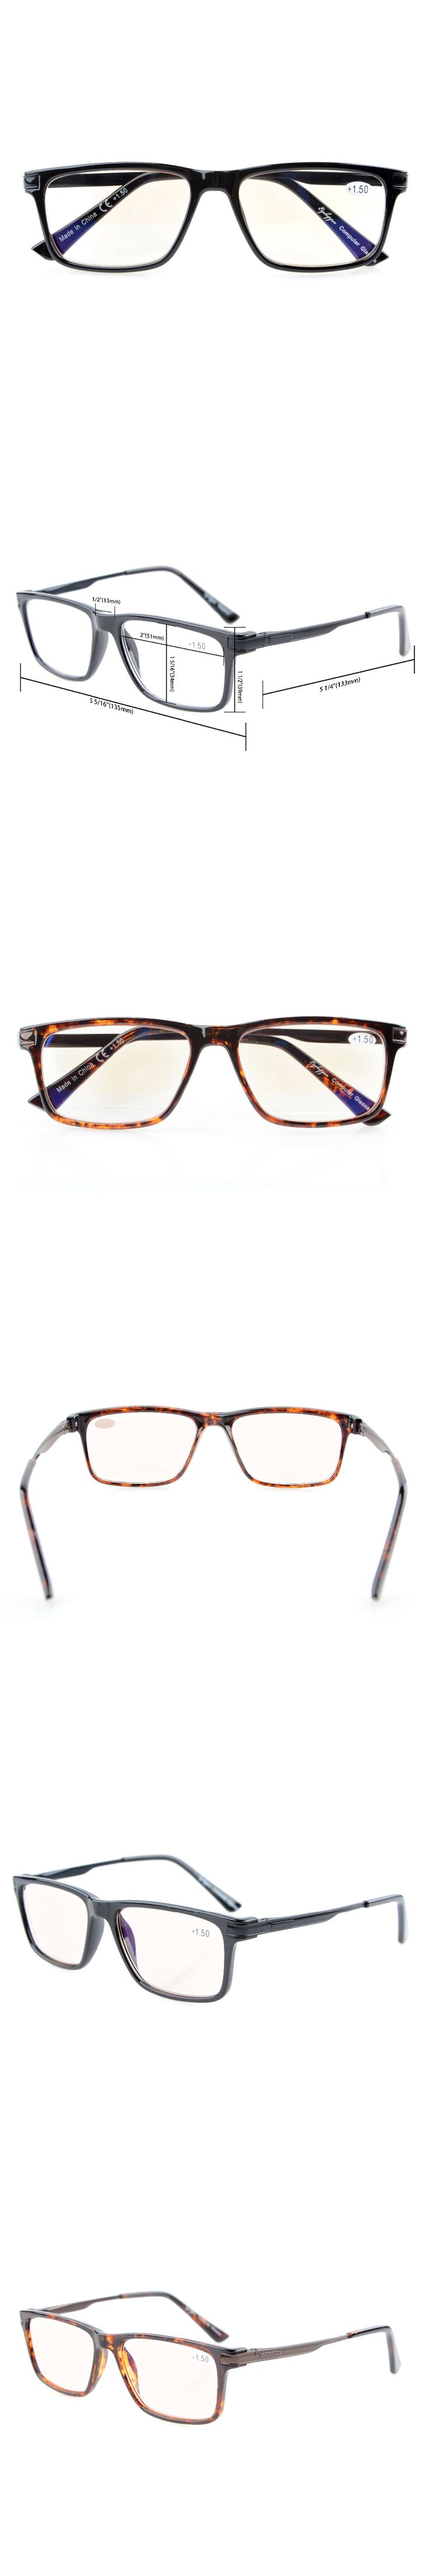 CGTR005 Eyekepper Amber Tinted Lenses Computer Readers Quality TR90 Frame Spring Hinges Computer Reading Glasses